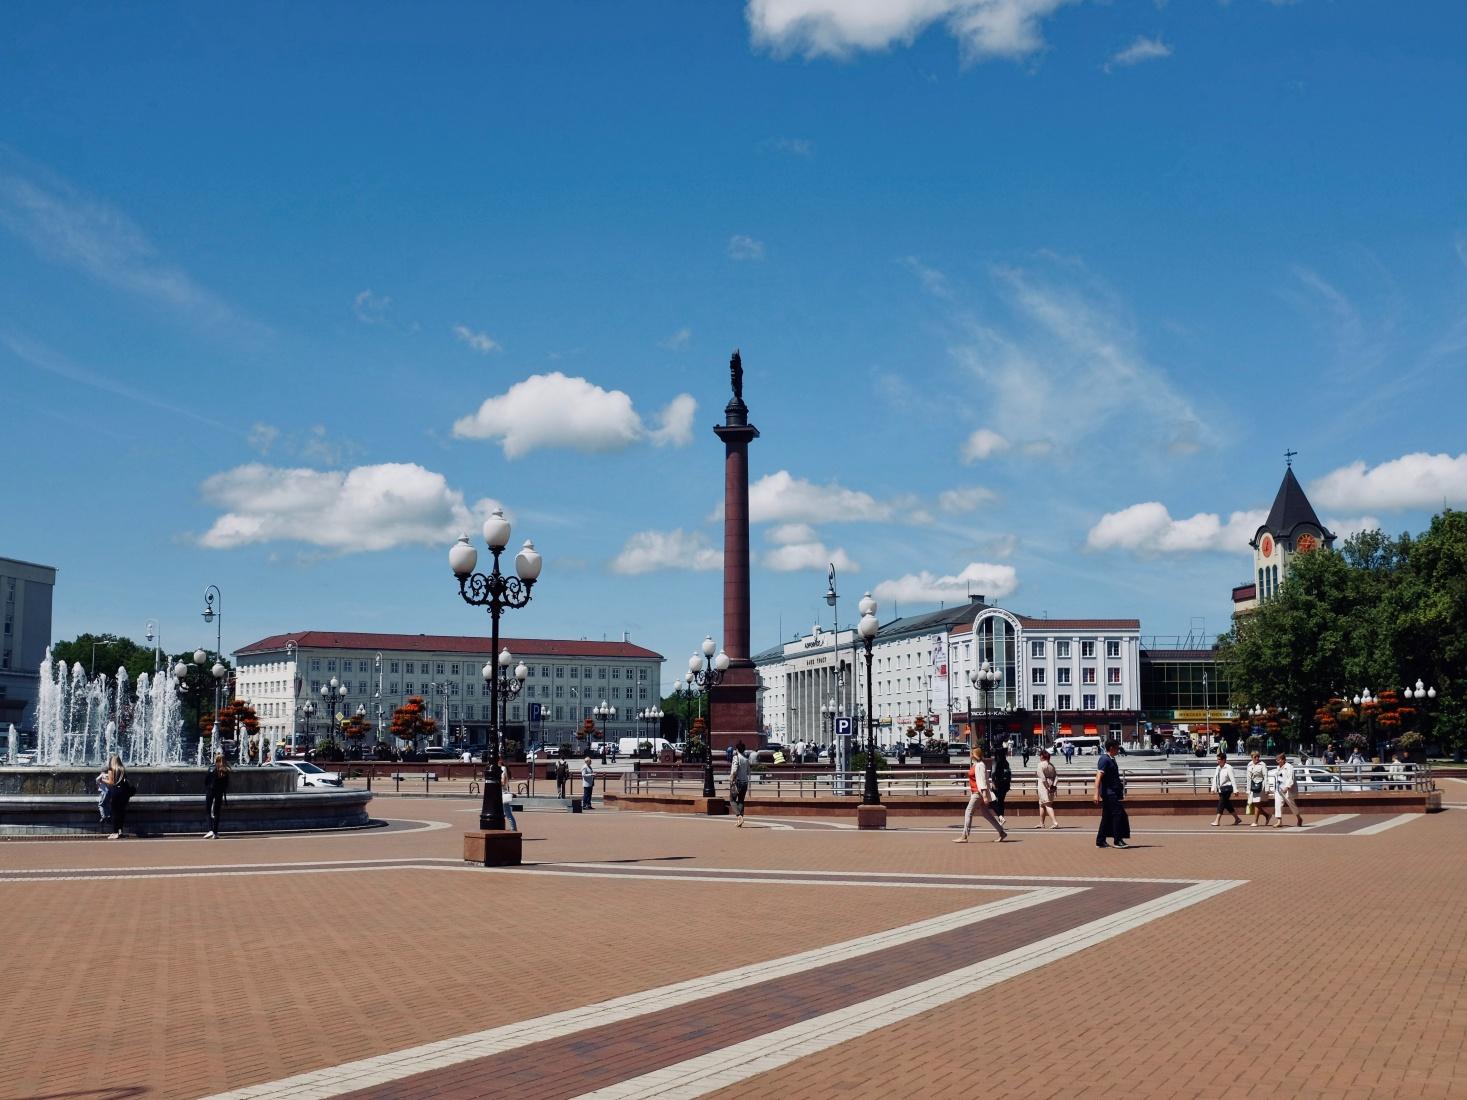 Ploshchad Pobedy, Victory Square, in northern Kaliningrad, Russia.